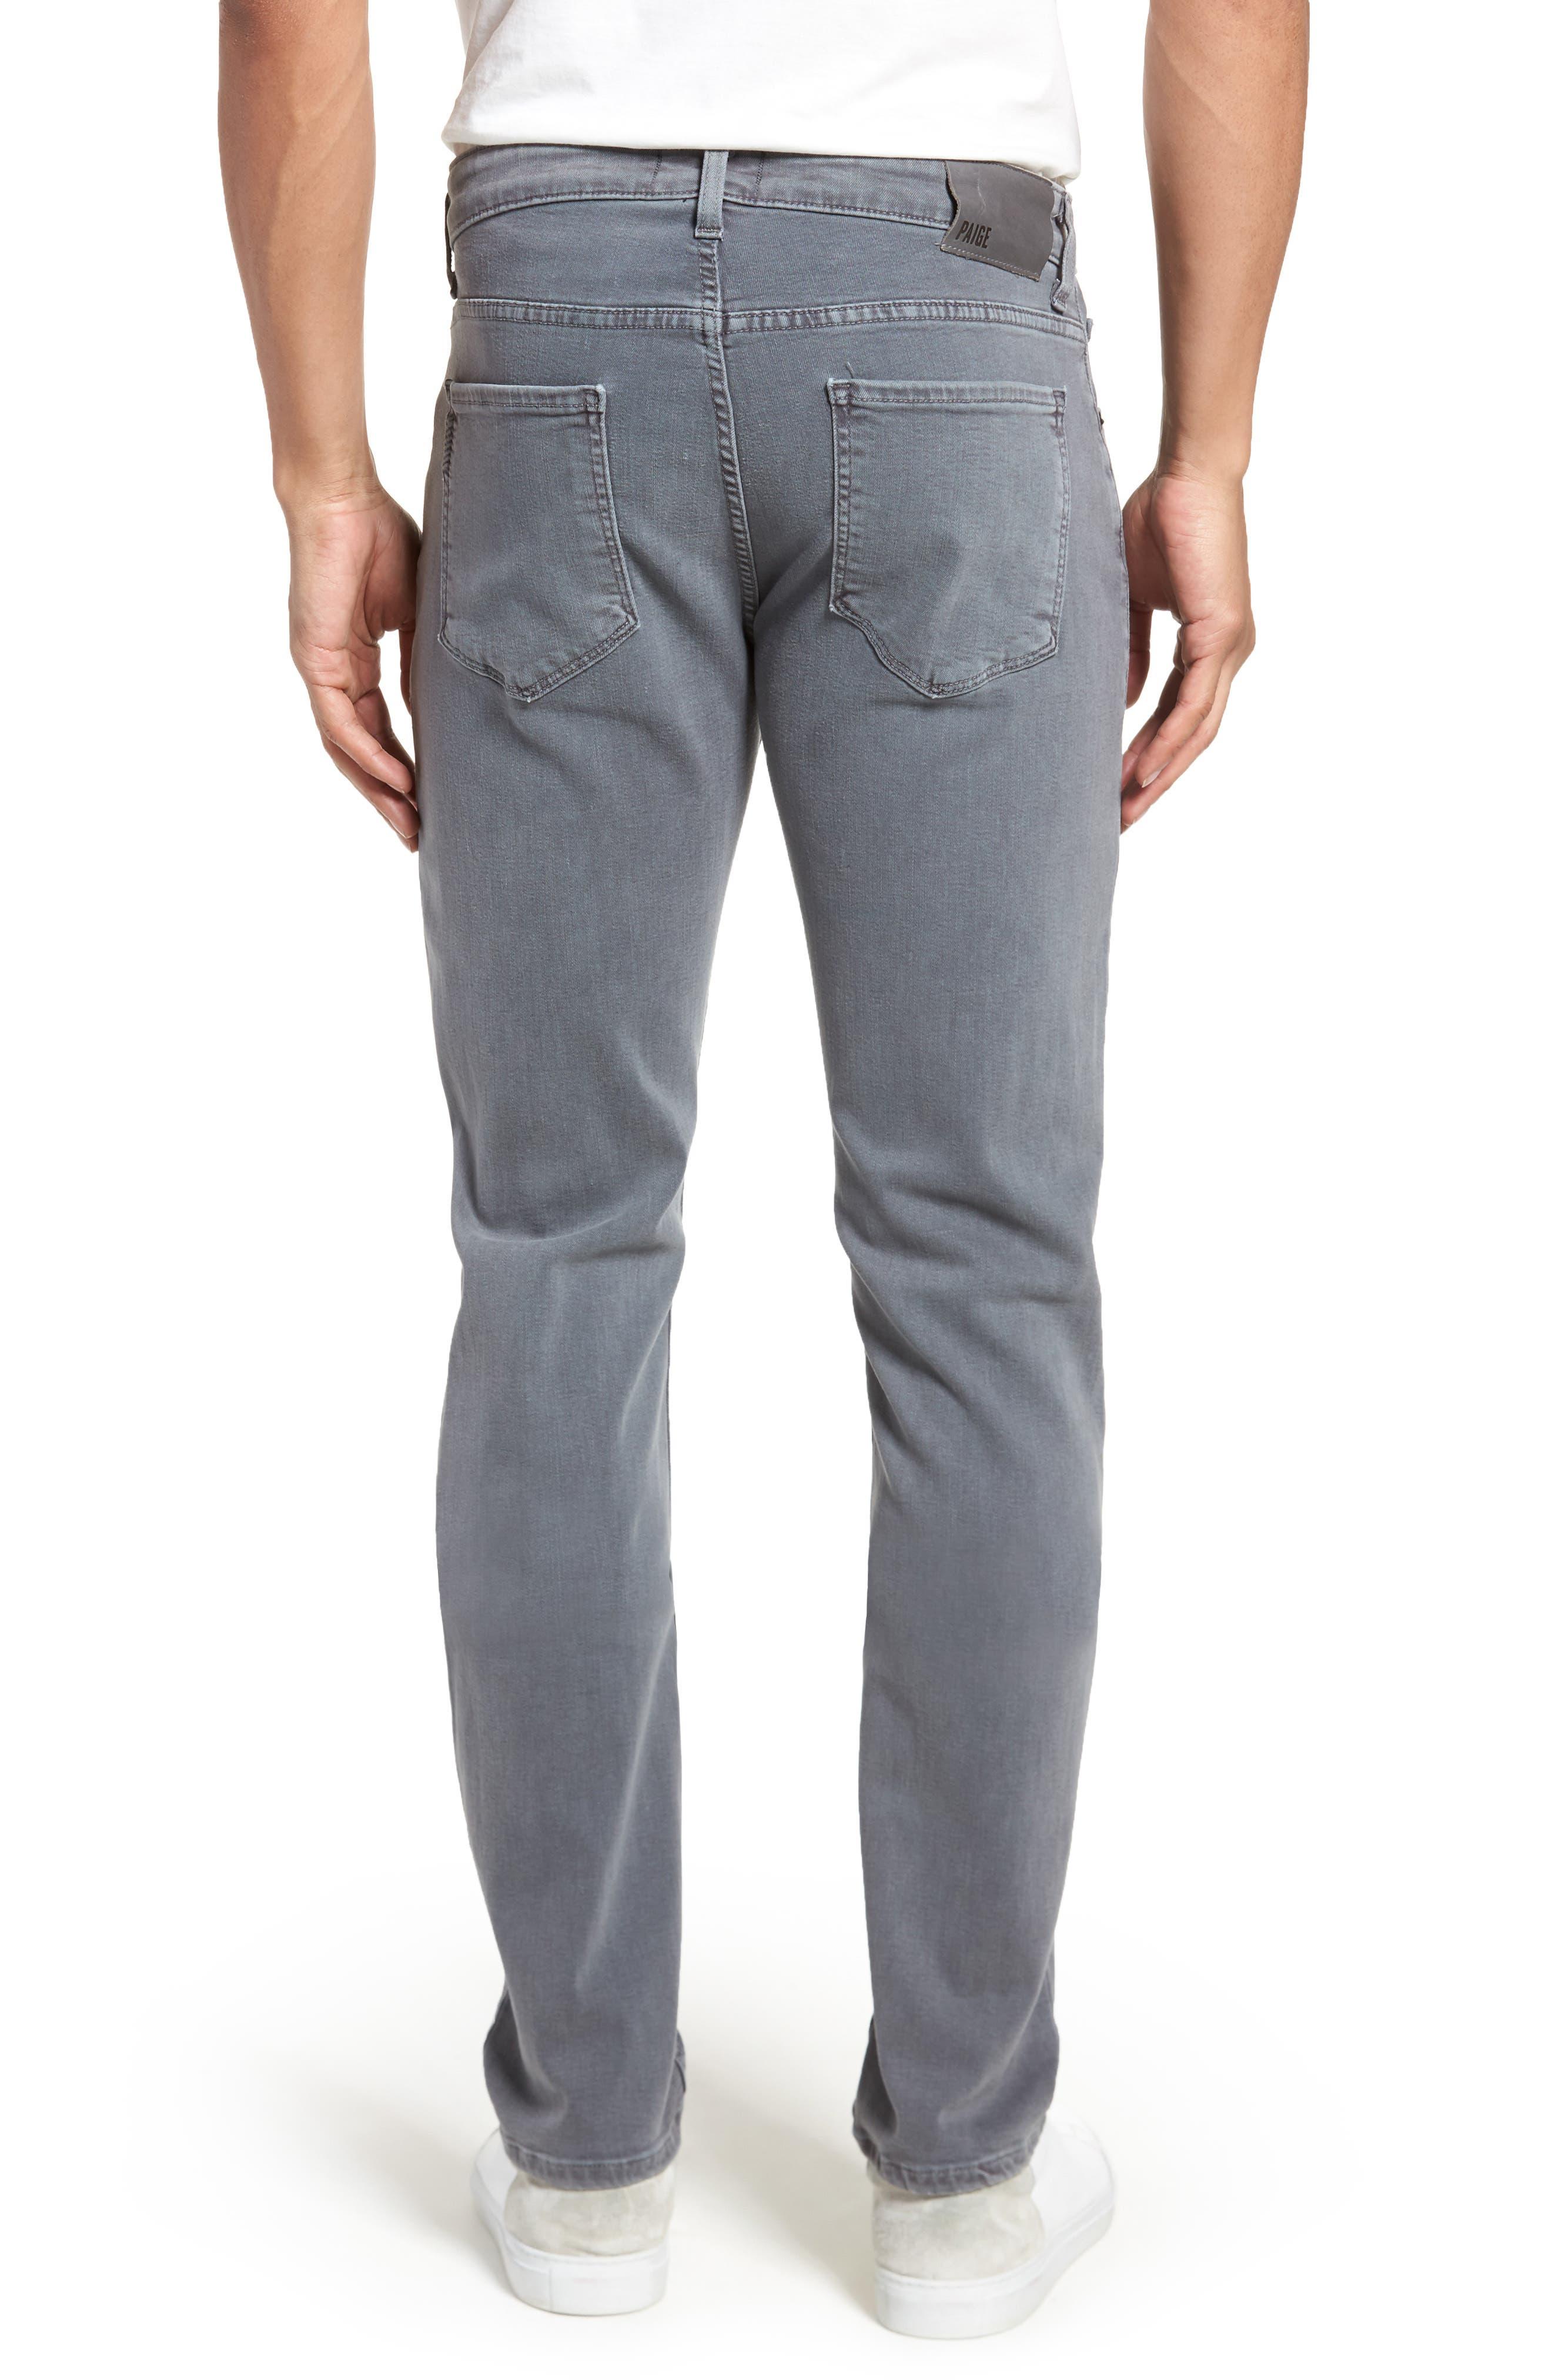 Transcend - Lennox Slim Fit Jeans,                             Alternate thumbnail 2, color,                             020